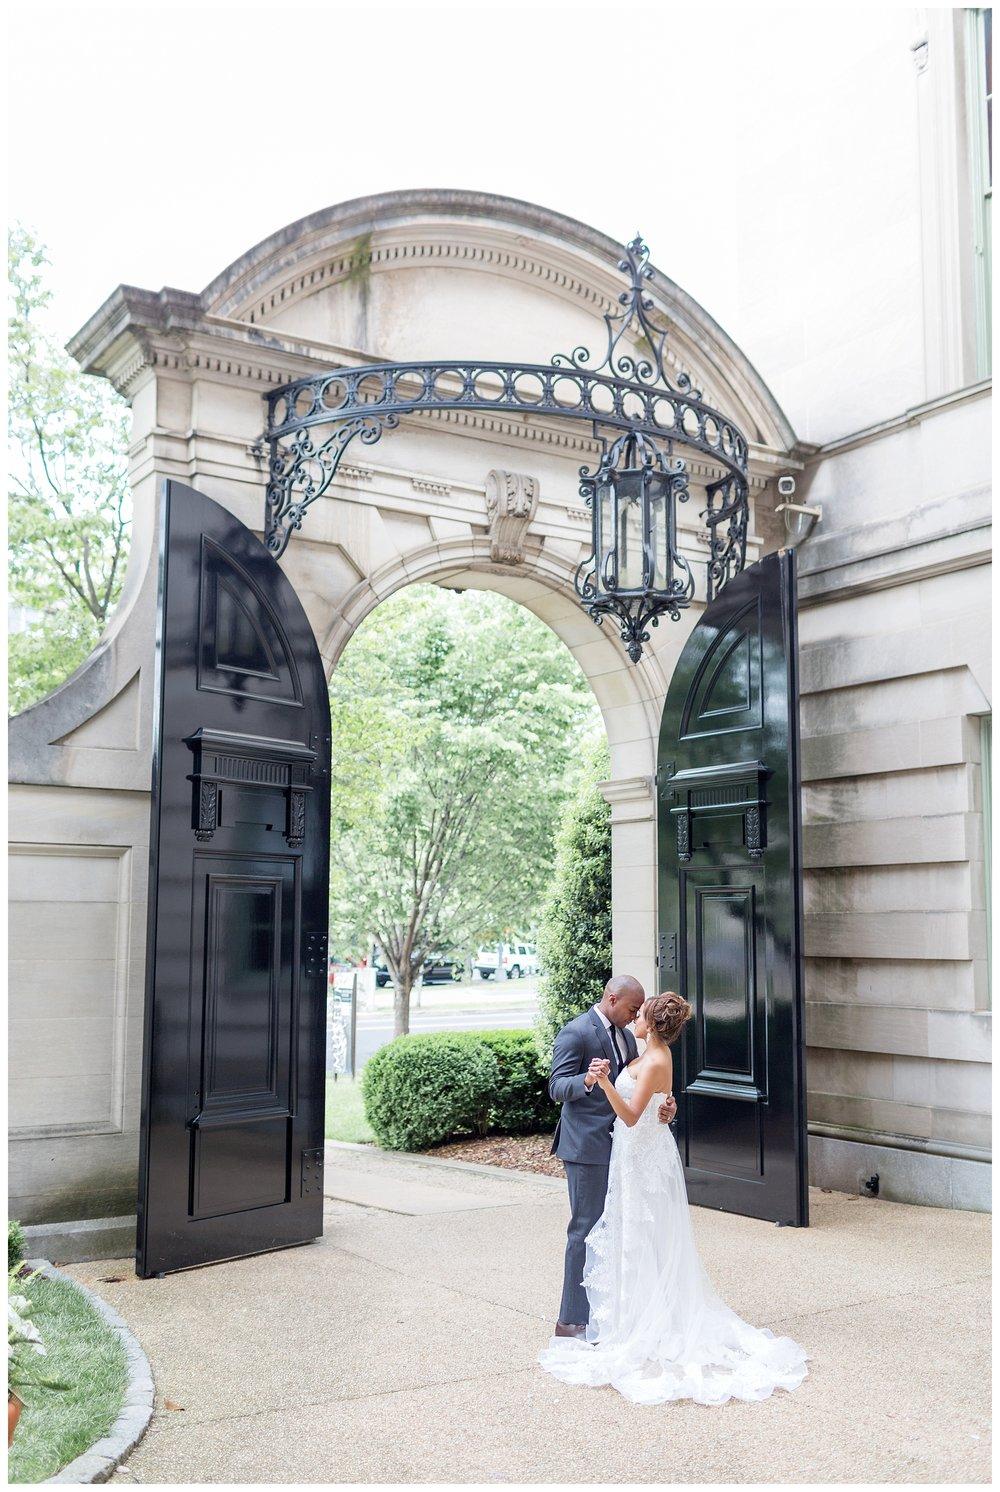 Anderson House Wedding DC Wedding Photographer Kir Tuben_0041.jpg